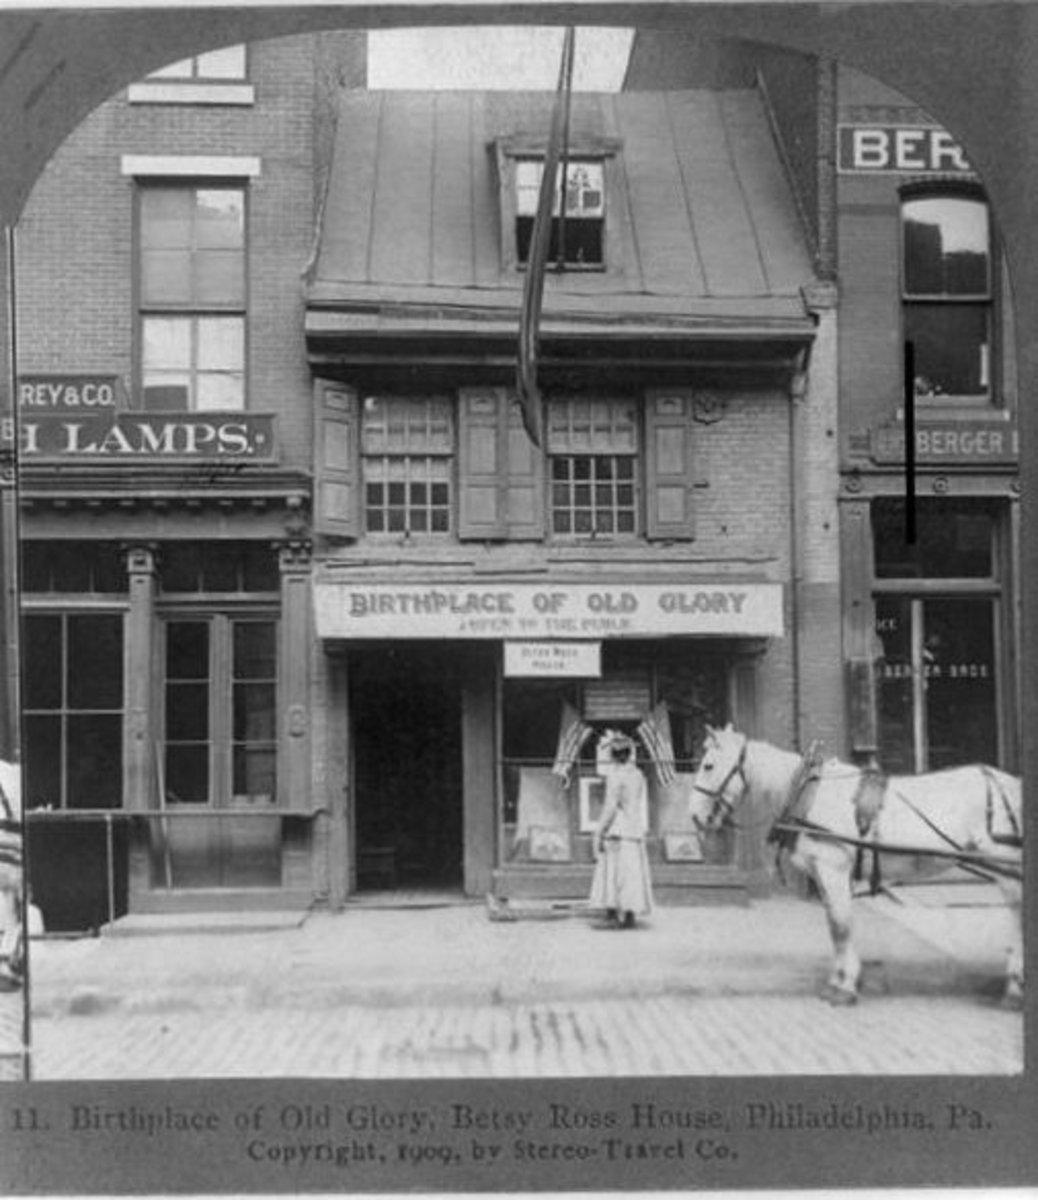 239 Arch Street, Betsy Ross house  circa 1898